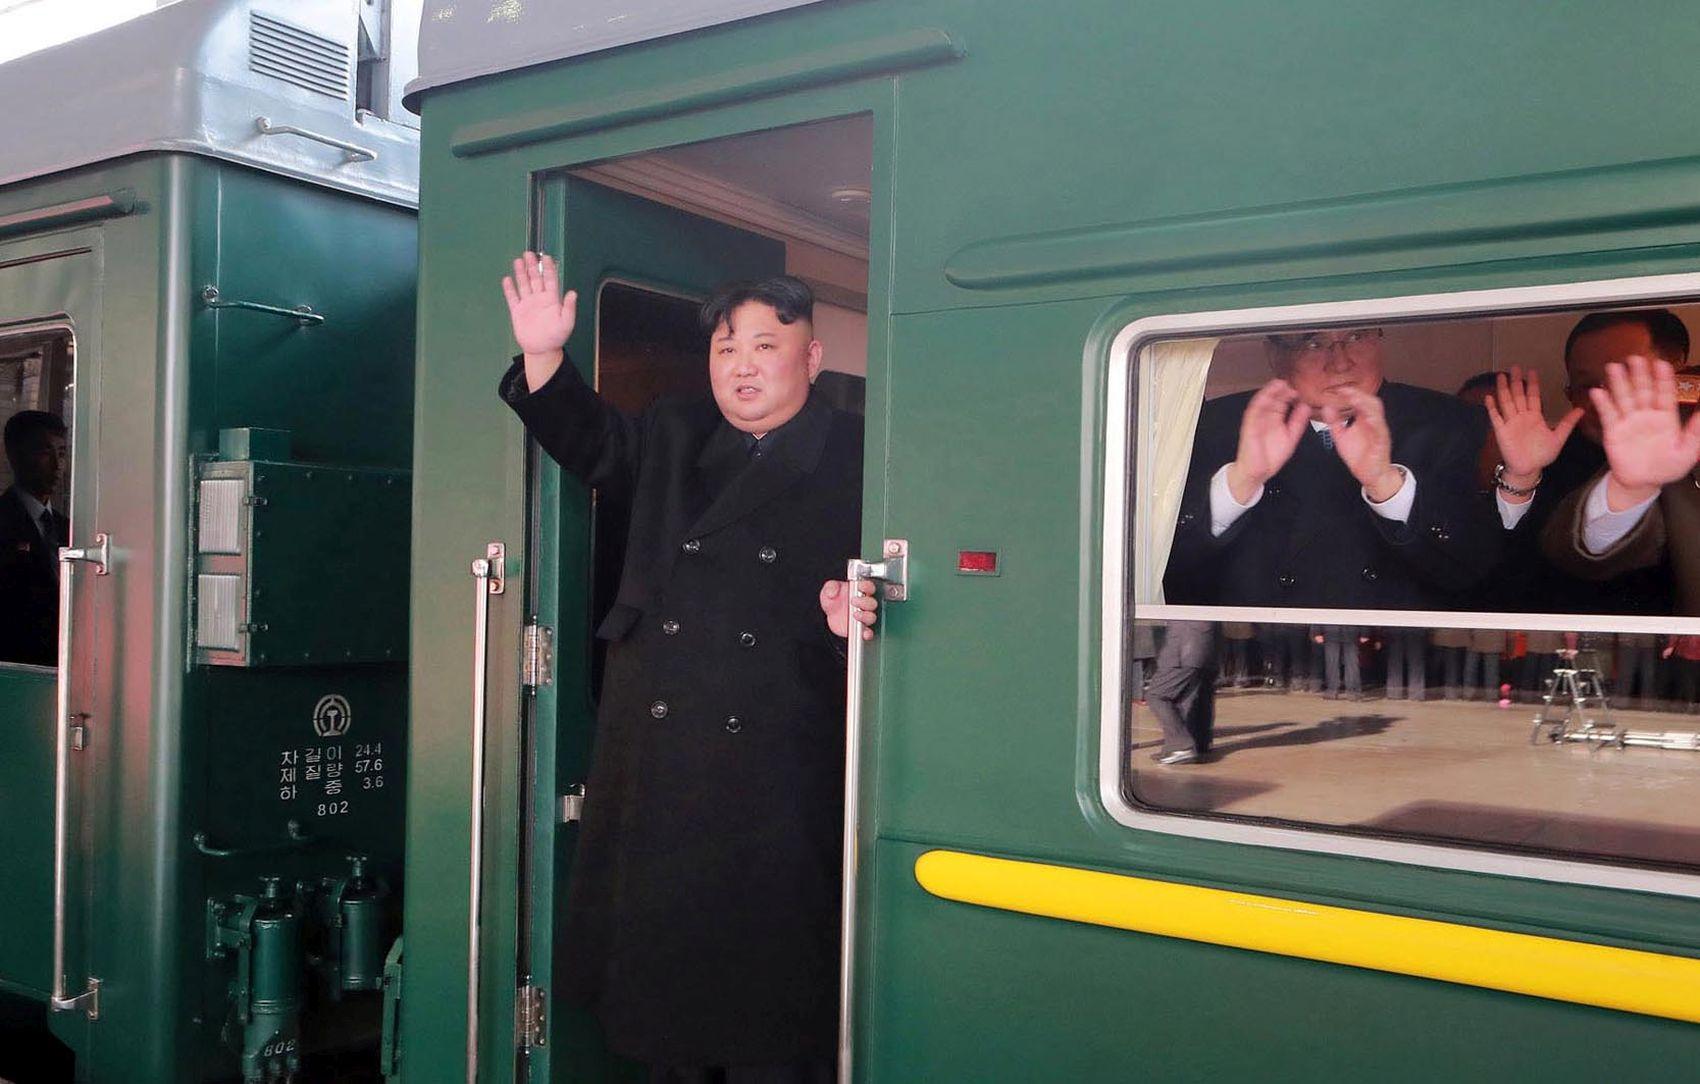 Mr. Abe, Don't Let President Trump Ease Sanctions on North Korea